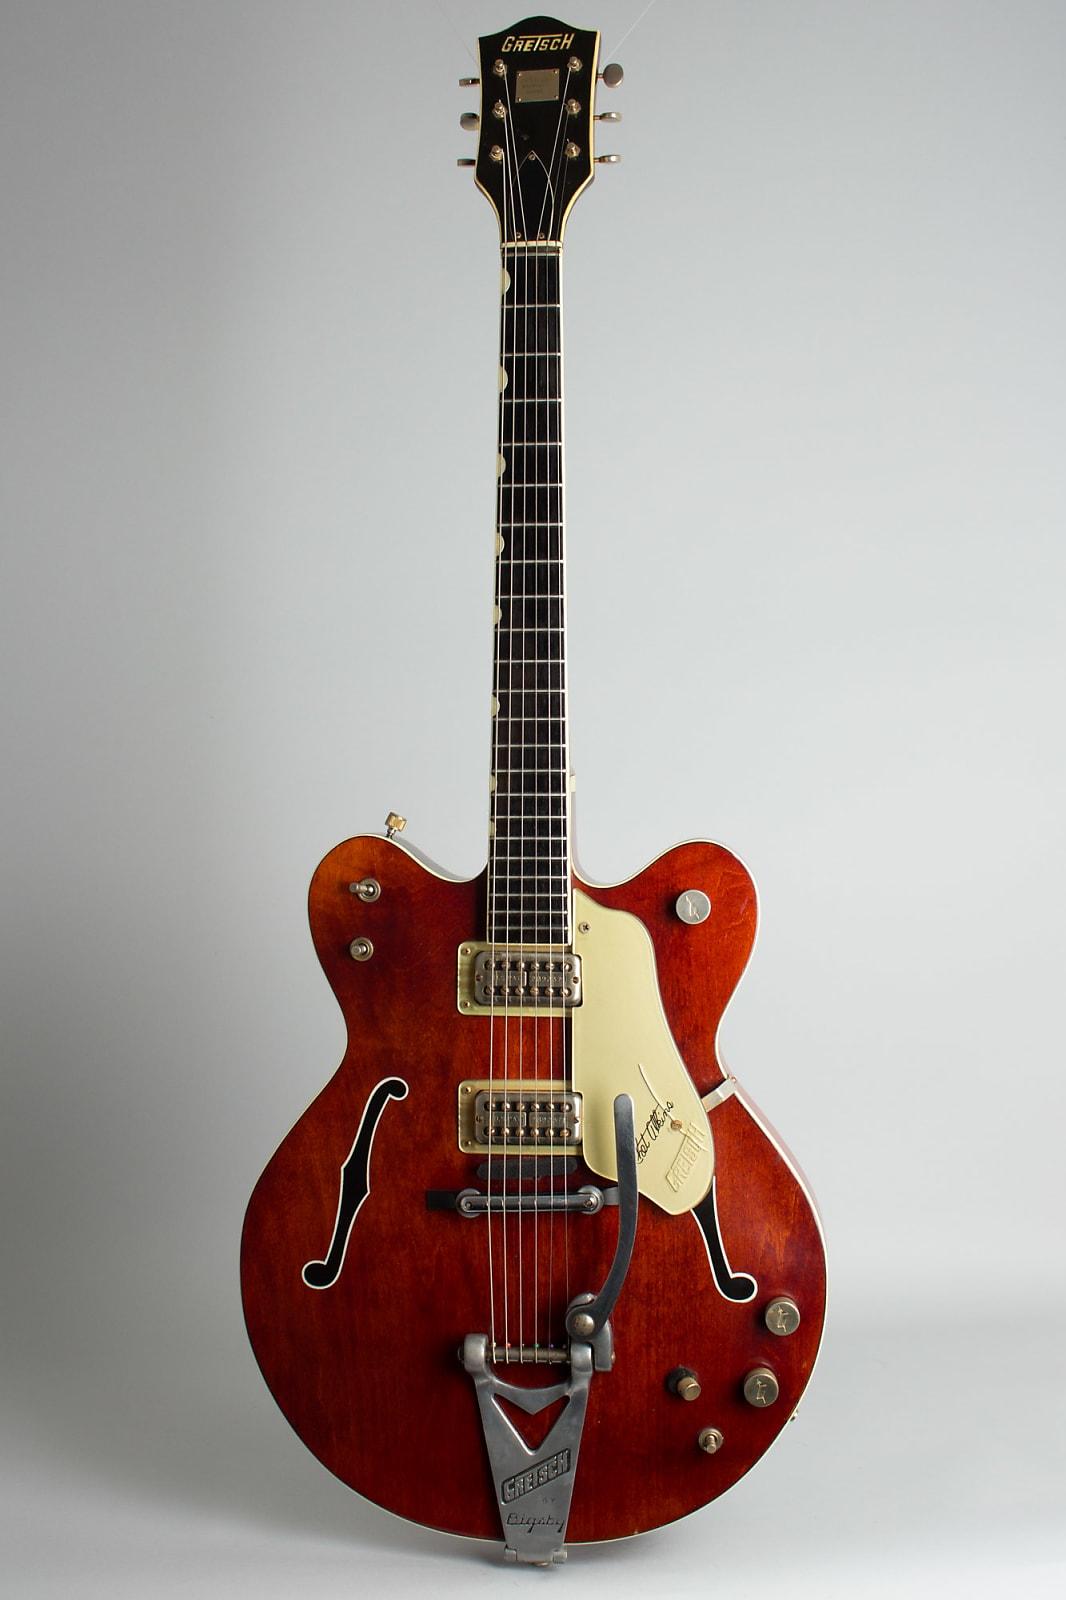 Gretsch  Model 6120 Chet Atkins Nashville Thinline Hollow Body Electric Guitar (1965), ser. #80899, original white tolex hard shell case.